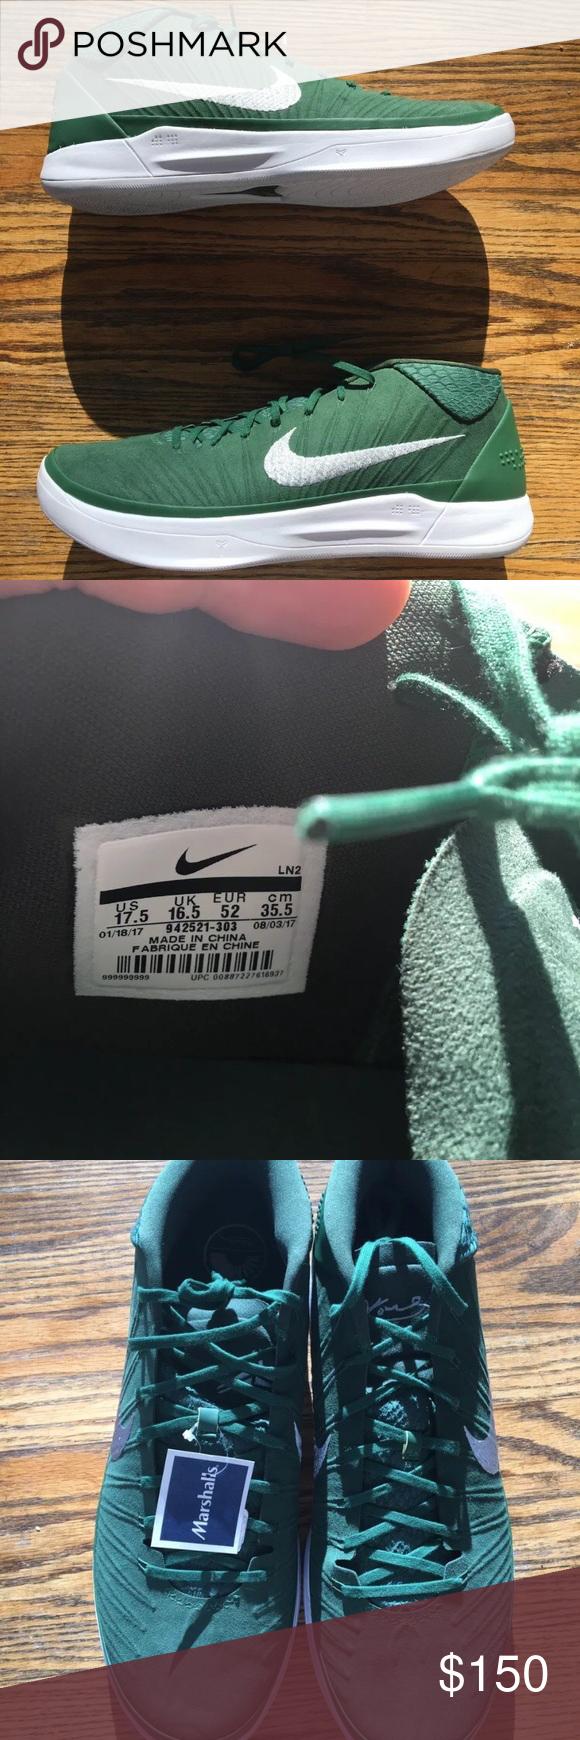 a1937877a51 Nike Kobe AD TB Promo Mens Basketball Shoes 942521 New Without Box Nike Kobe  AD TB Promo Mens Basketball Shoes 942521-303 Gorge Green Silver Size 17.5  Nike ...